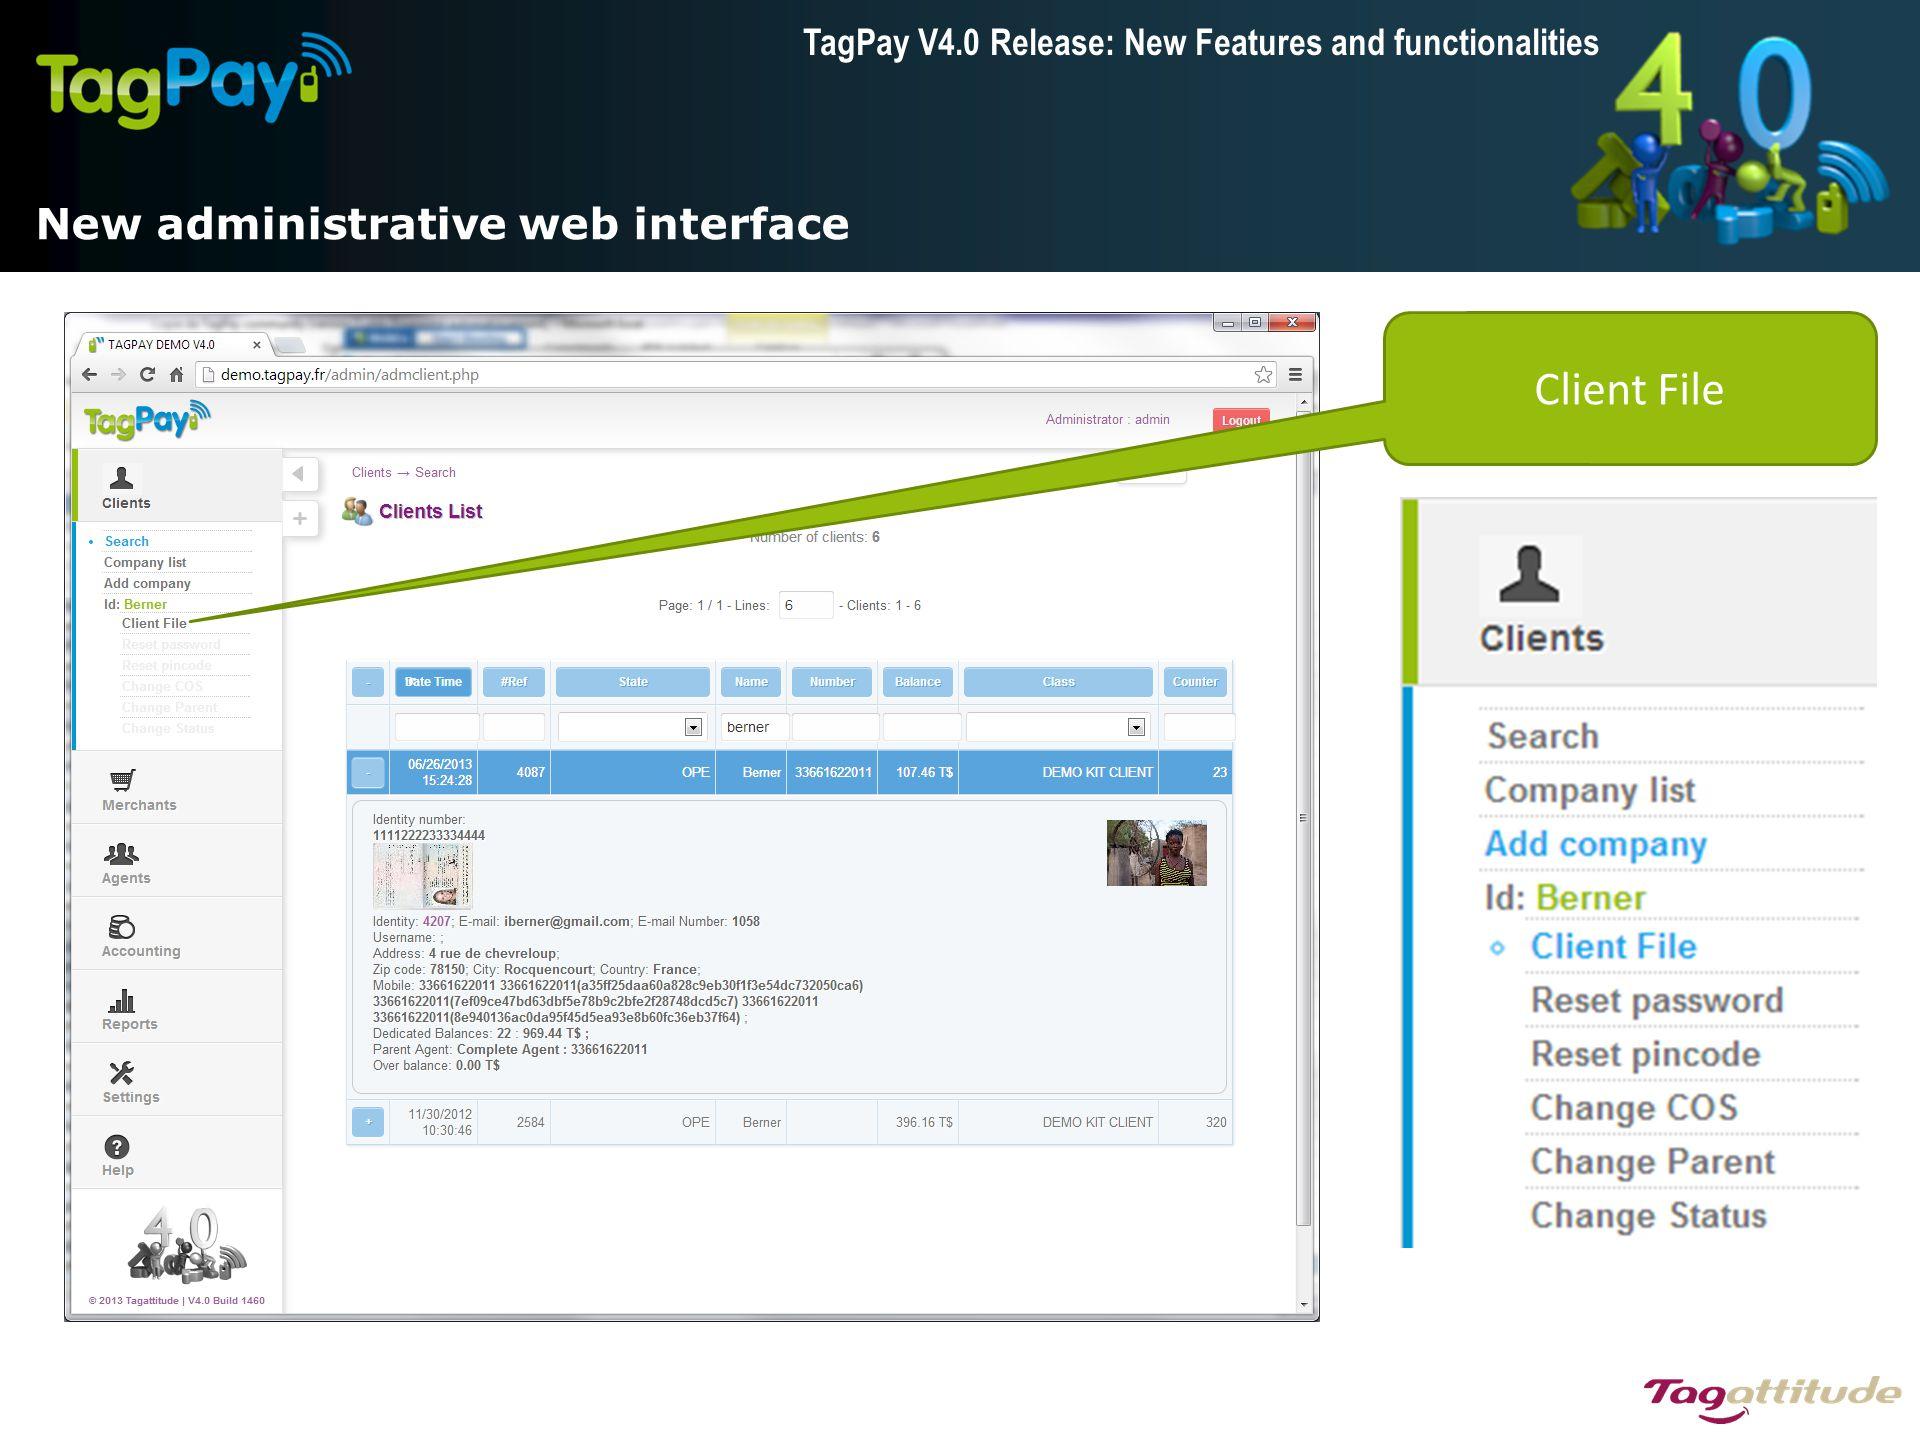 New administrative web interface